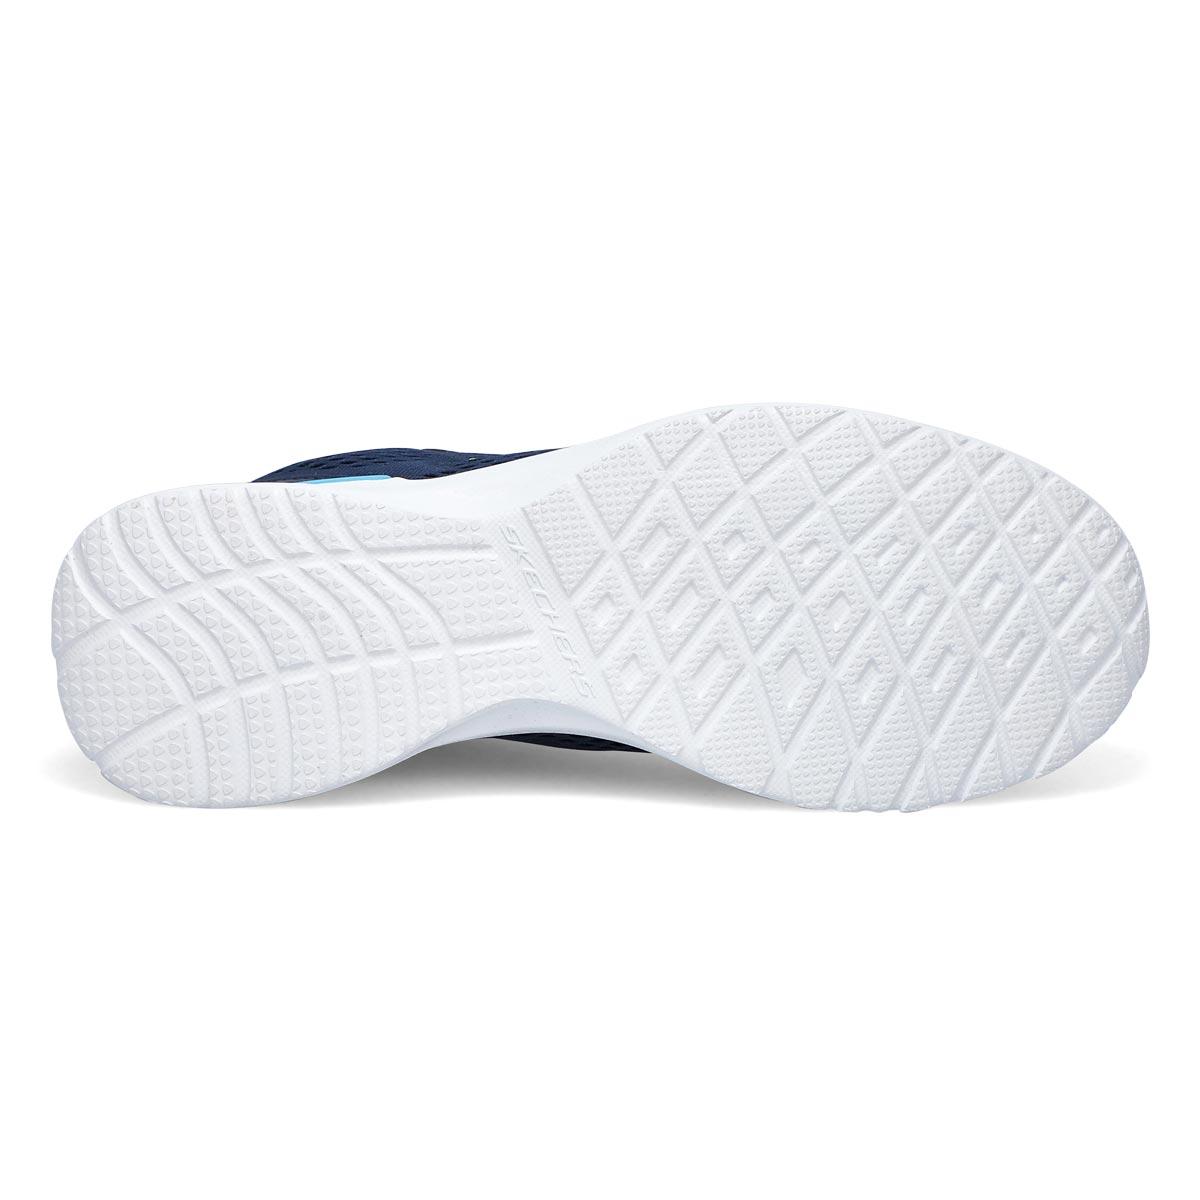 Men's Skech-Air Dynamight Sneaker - Navy